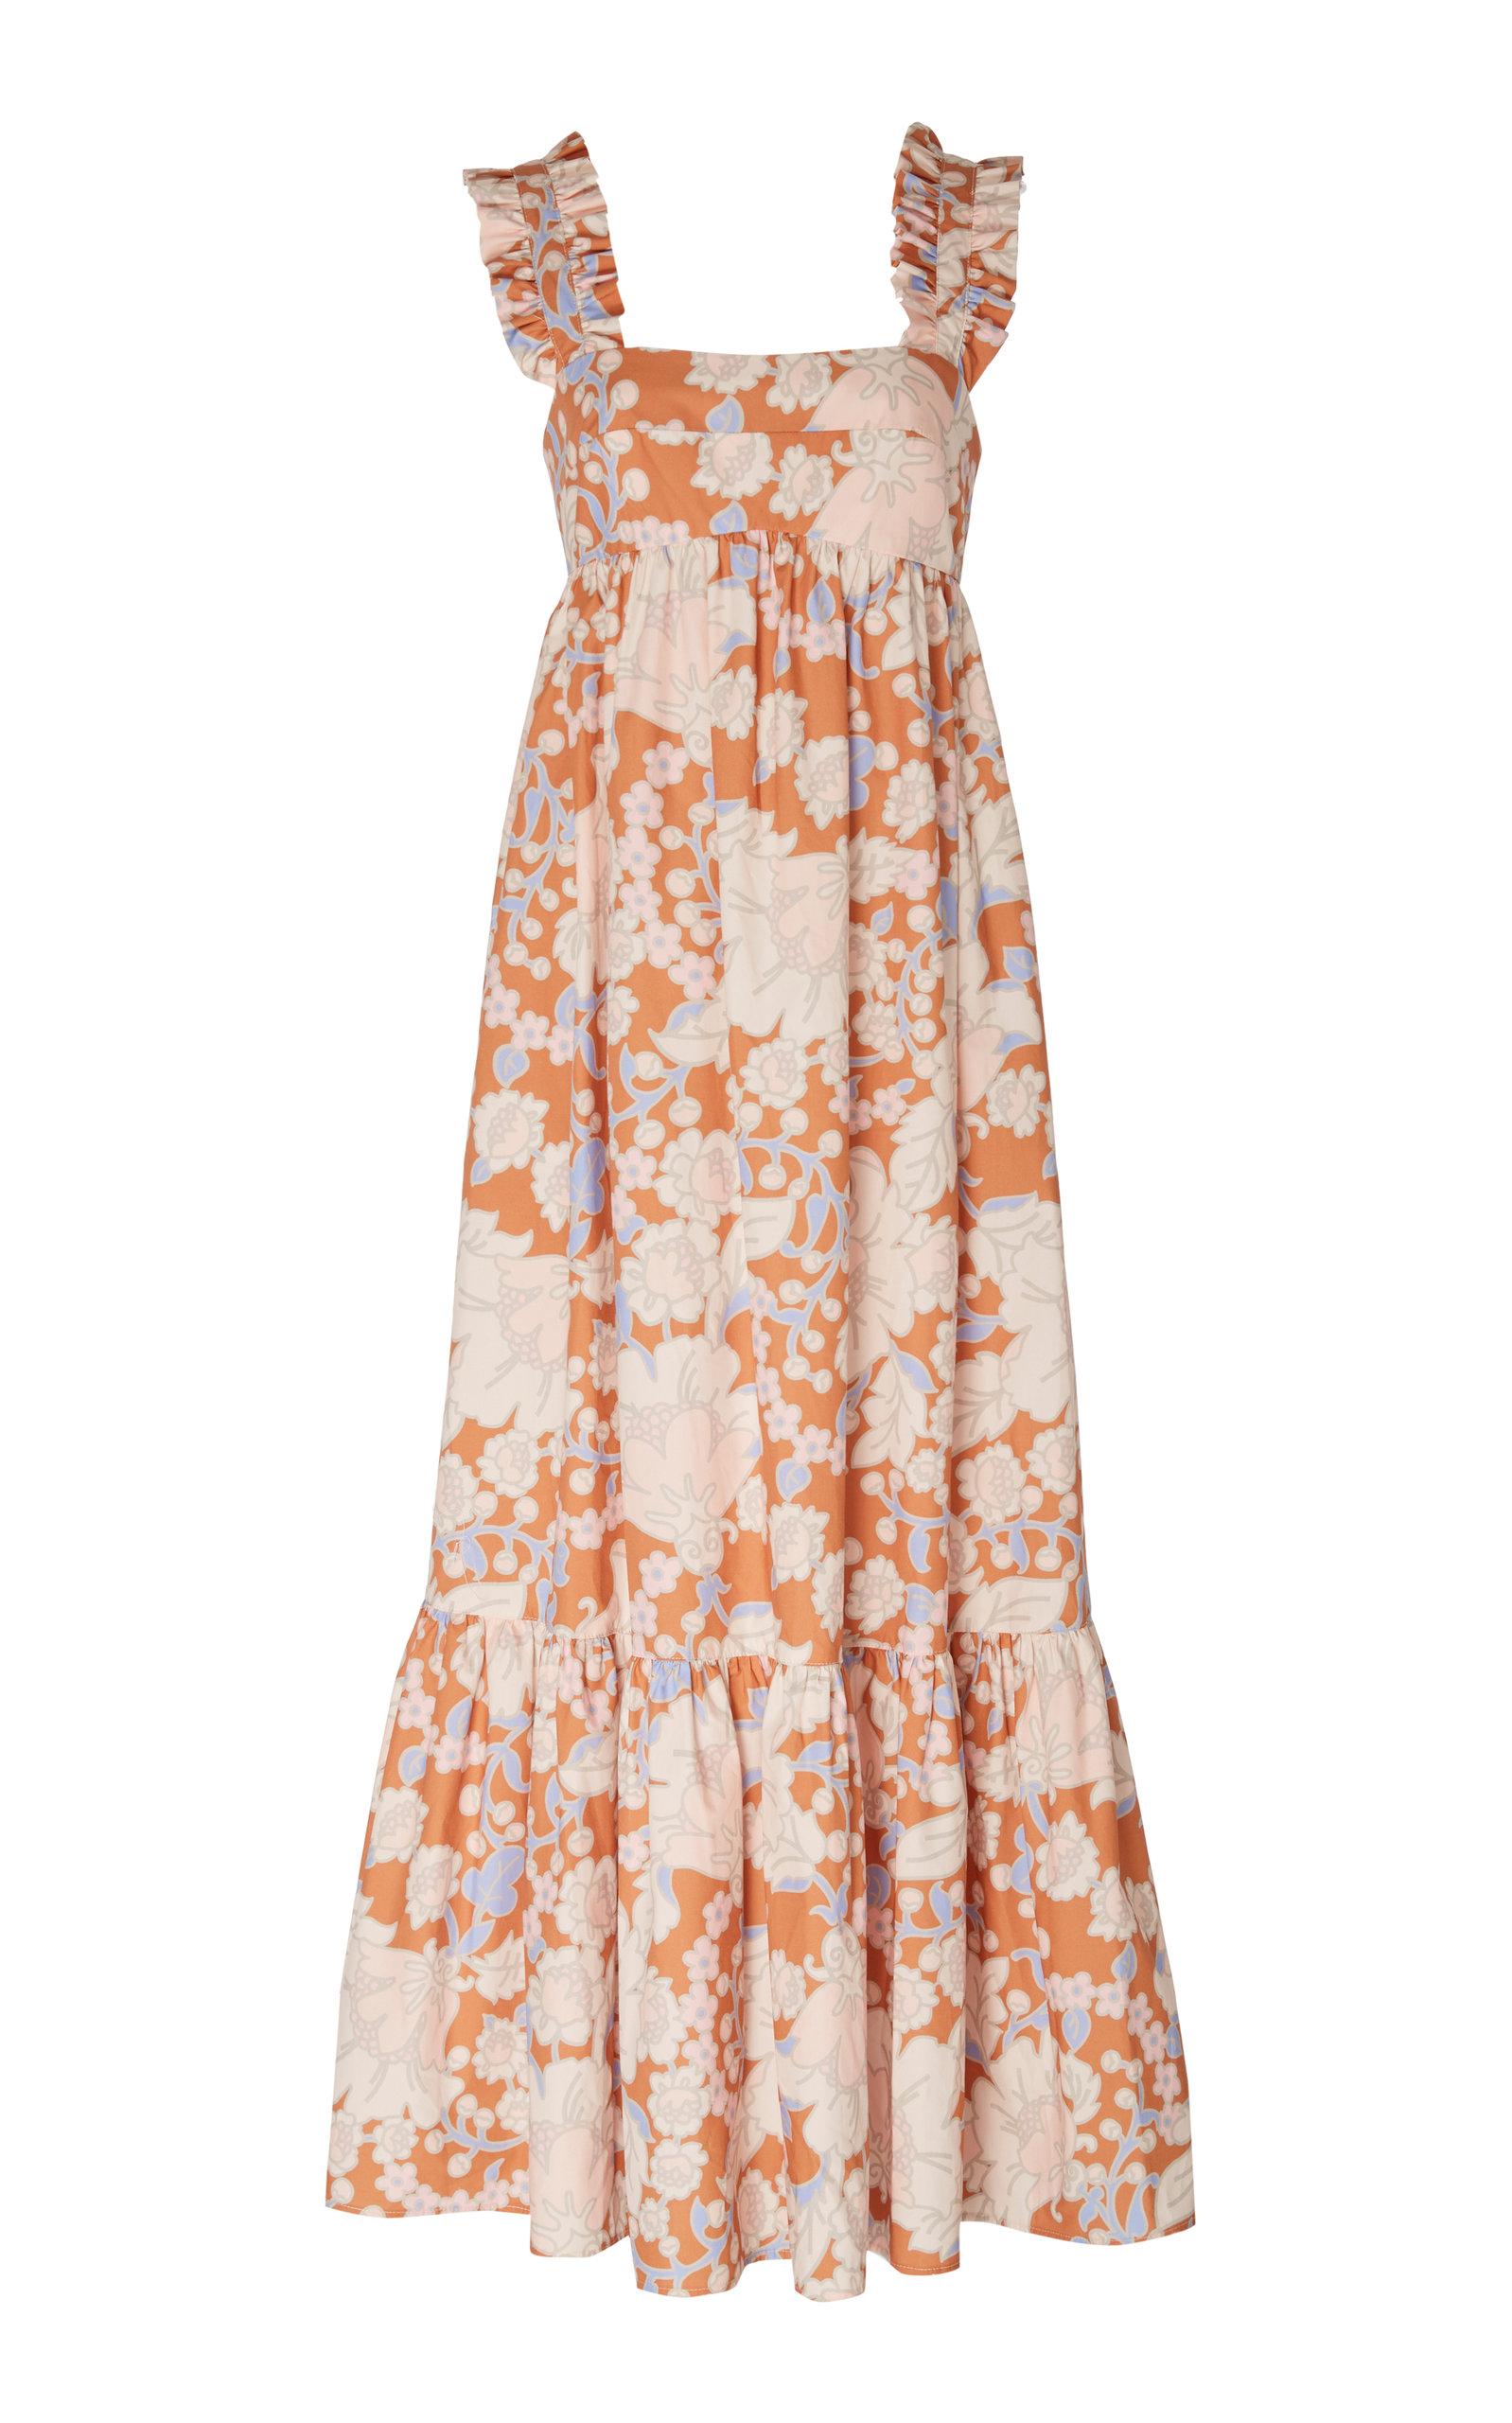 Buy Ephemera Woodstock Ruffled Floral-Print Linen Midi DRess online, shop Ephemera at the best price